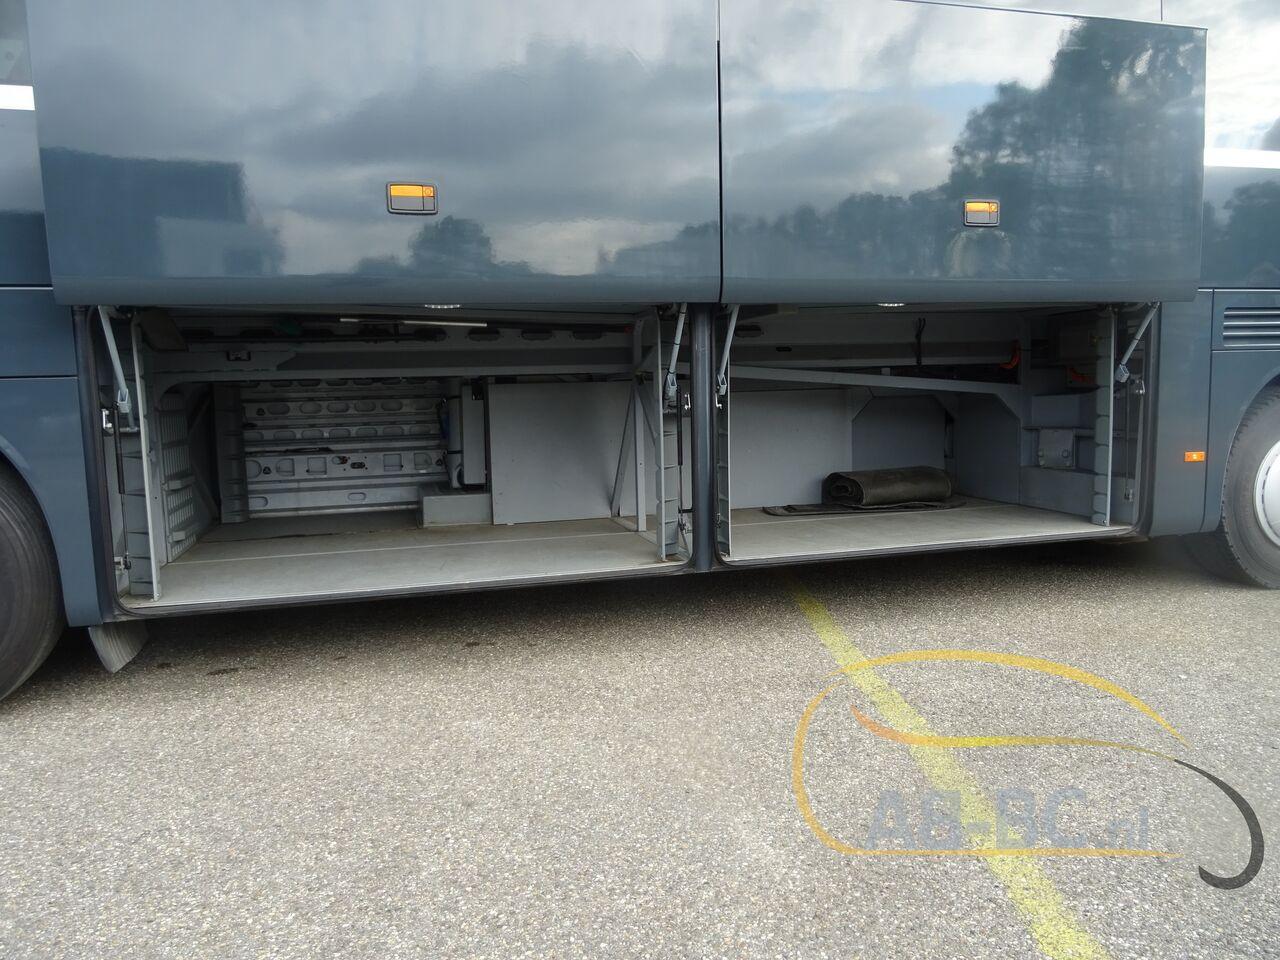 coach-busSETRA-S415-GT-HD-FINAL-EDITION---1627456902403610858_big_7ca4771a48728a7eb774d3ac63ae99e2--21050713010665719300